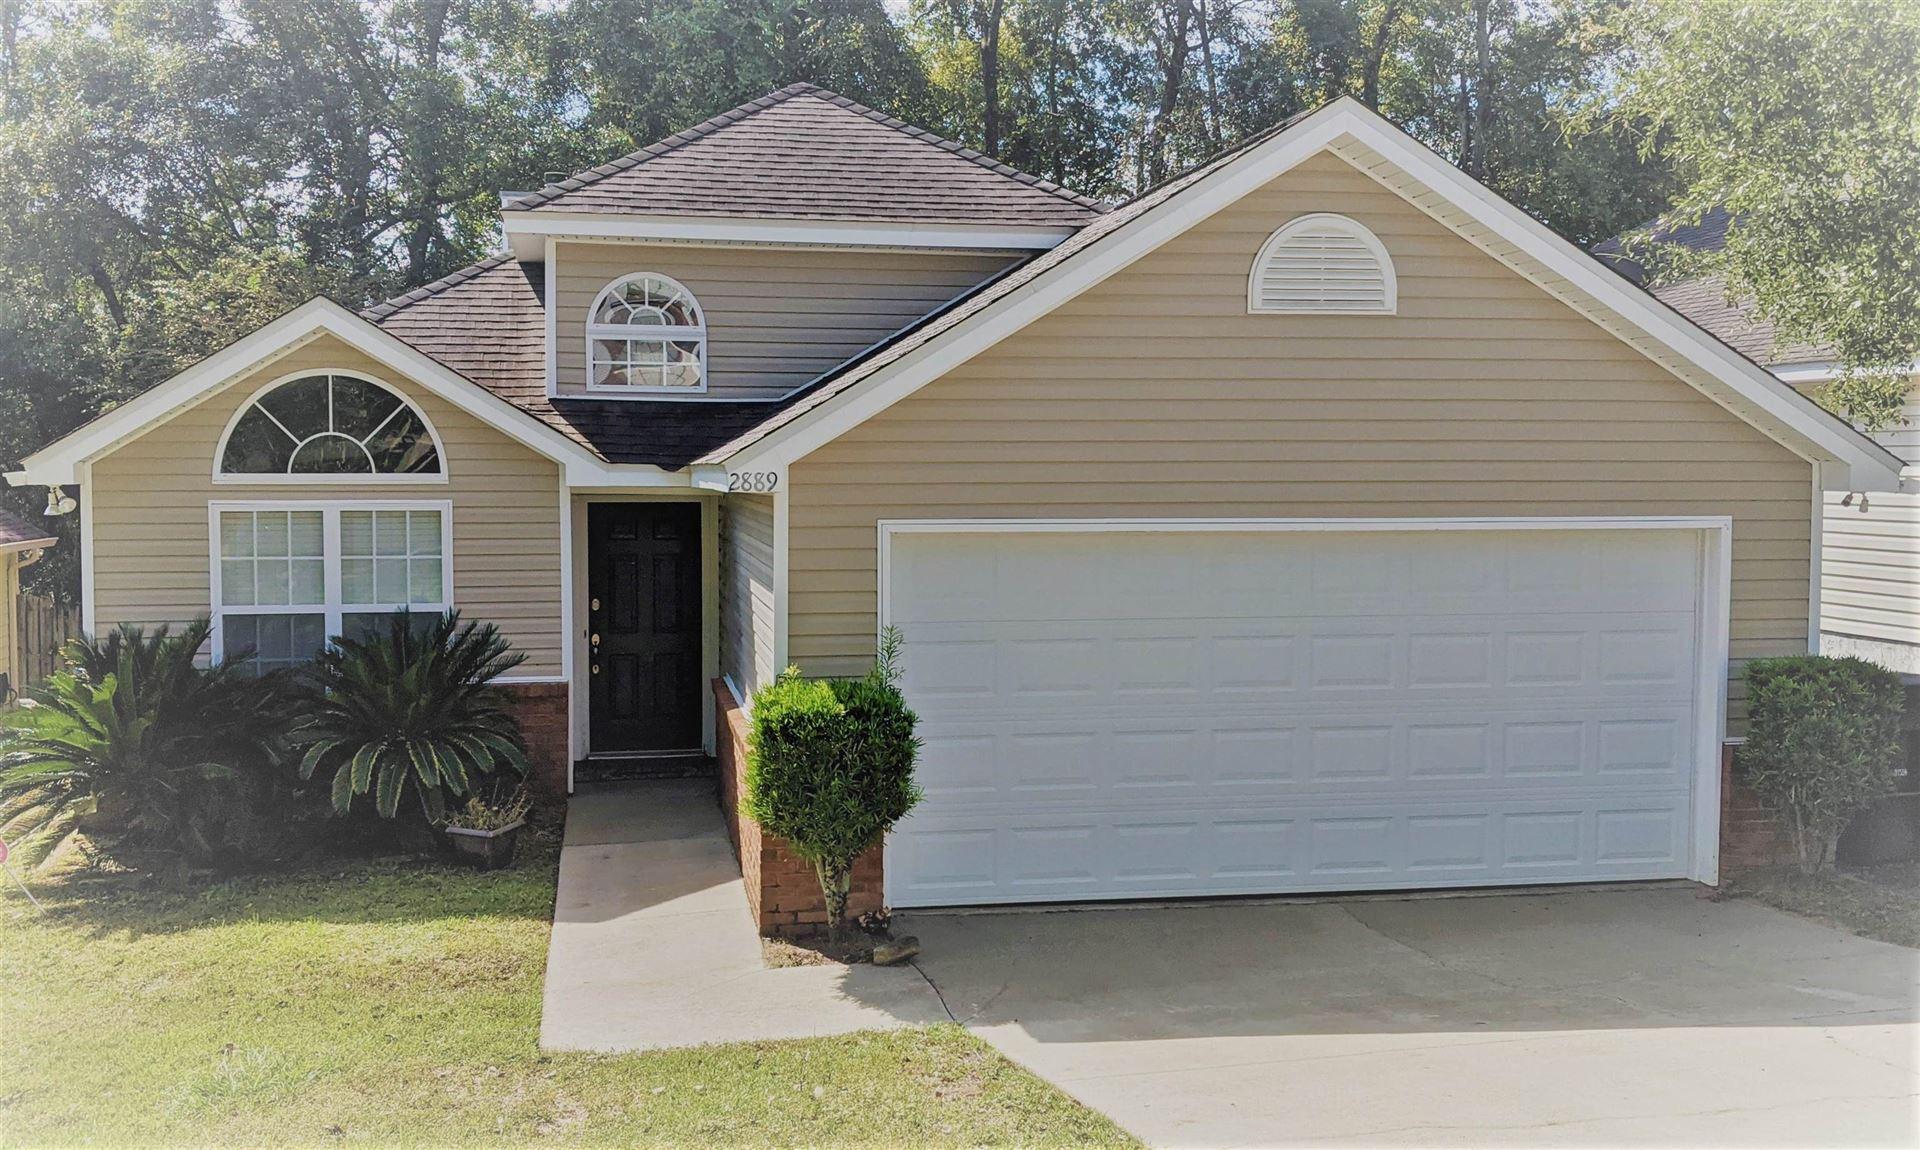 2889 Alexis Lane, Tallahassee, FL 32308 - MLS#: 338606